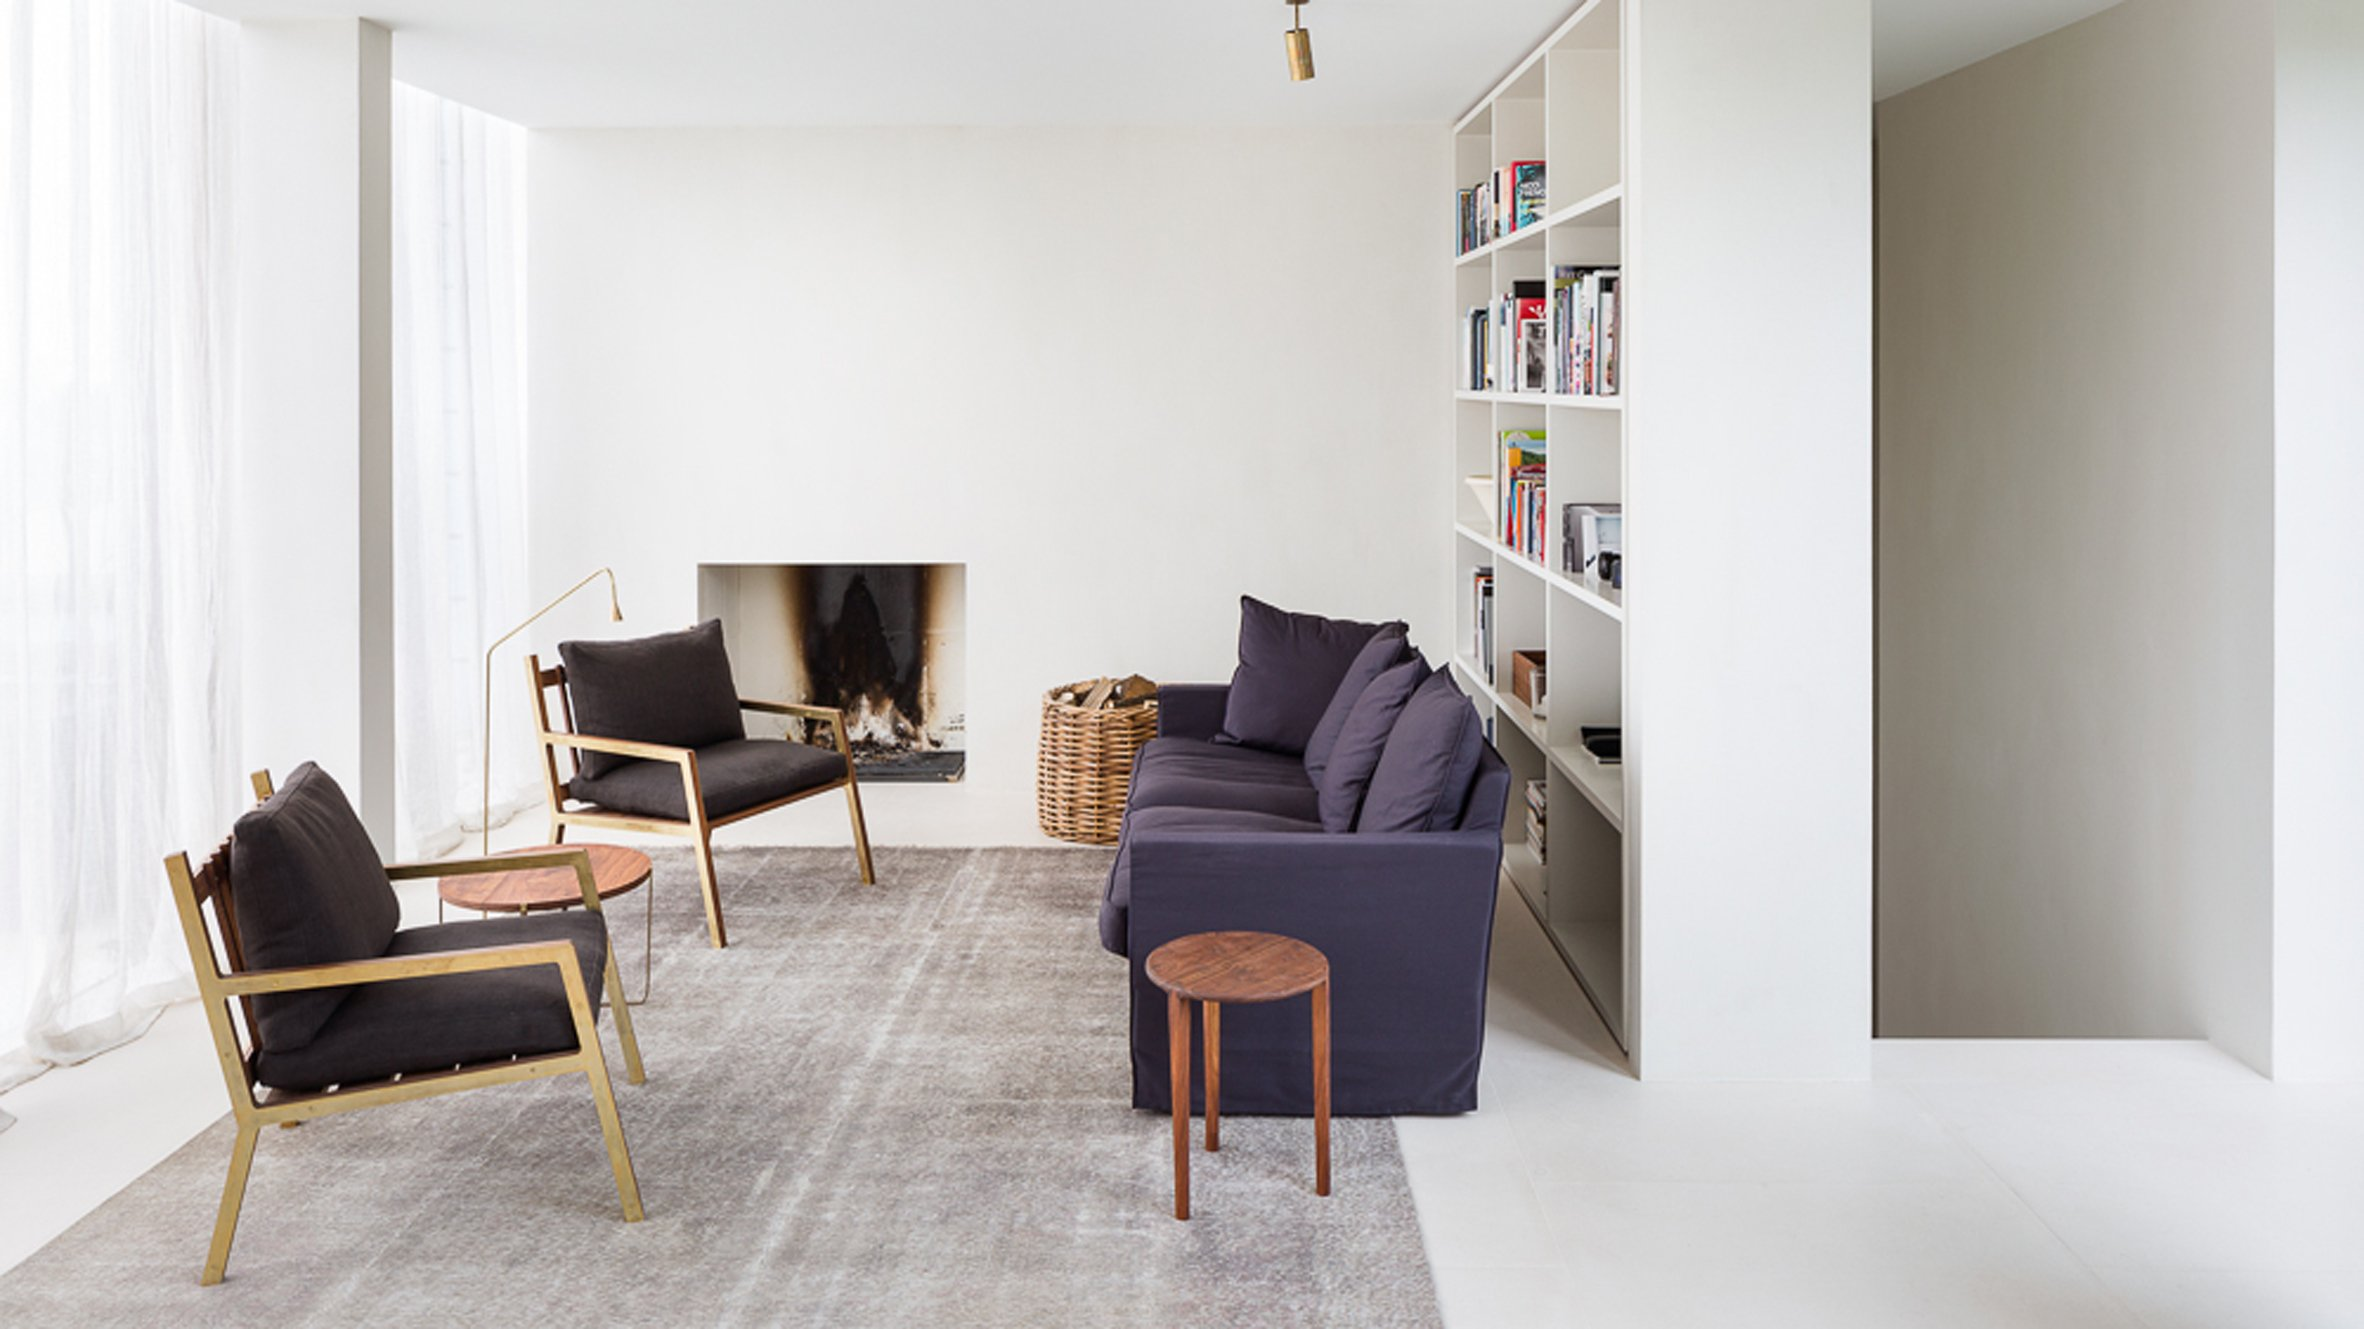 Hans Verstuyft converts 1960s Antwerp office into minimal penthouse